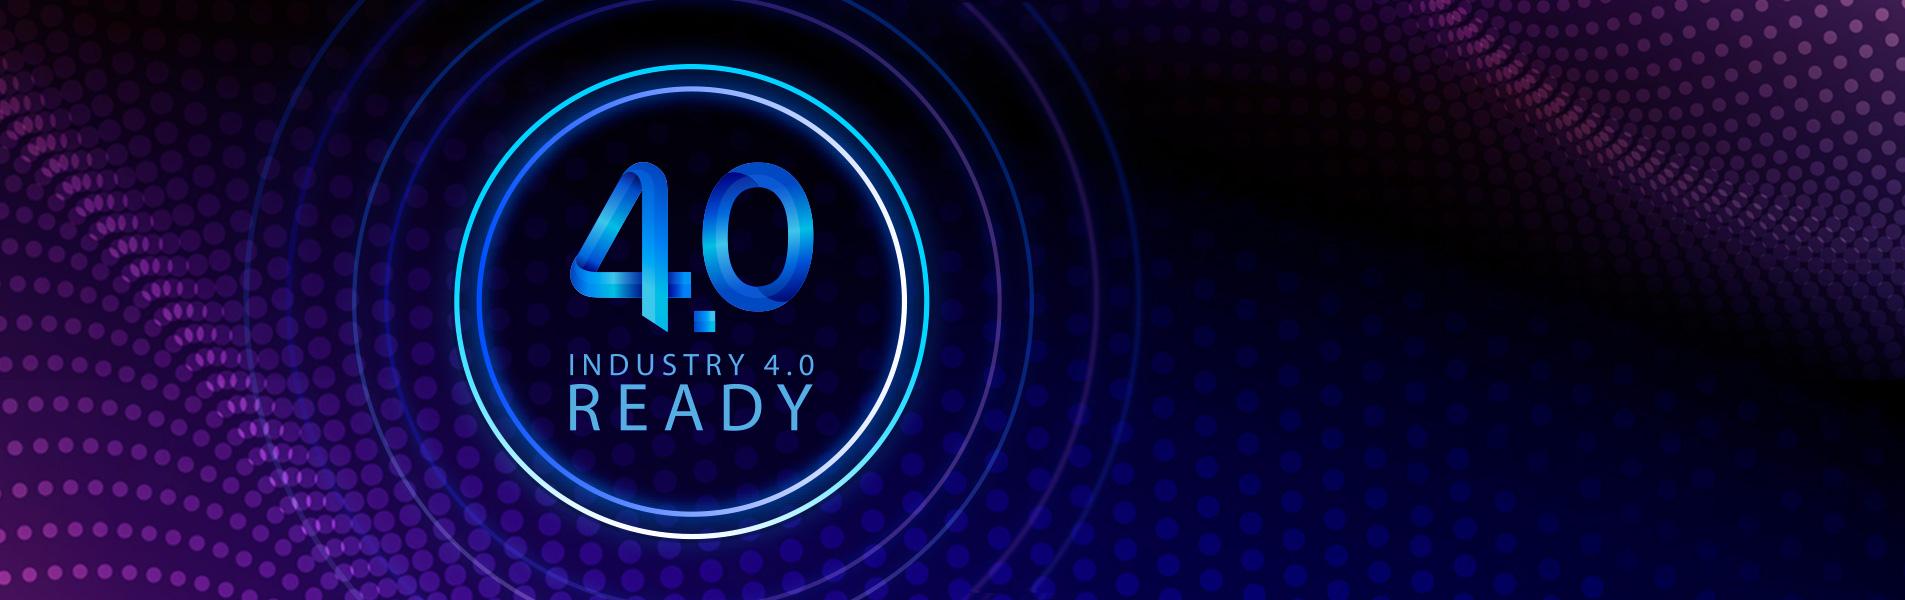 industry 4.0 ready